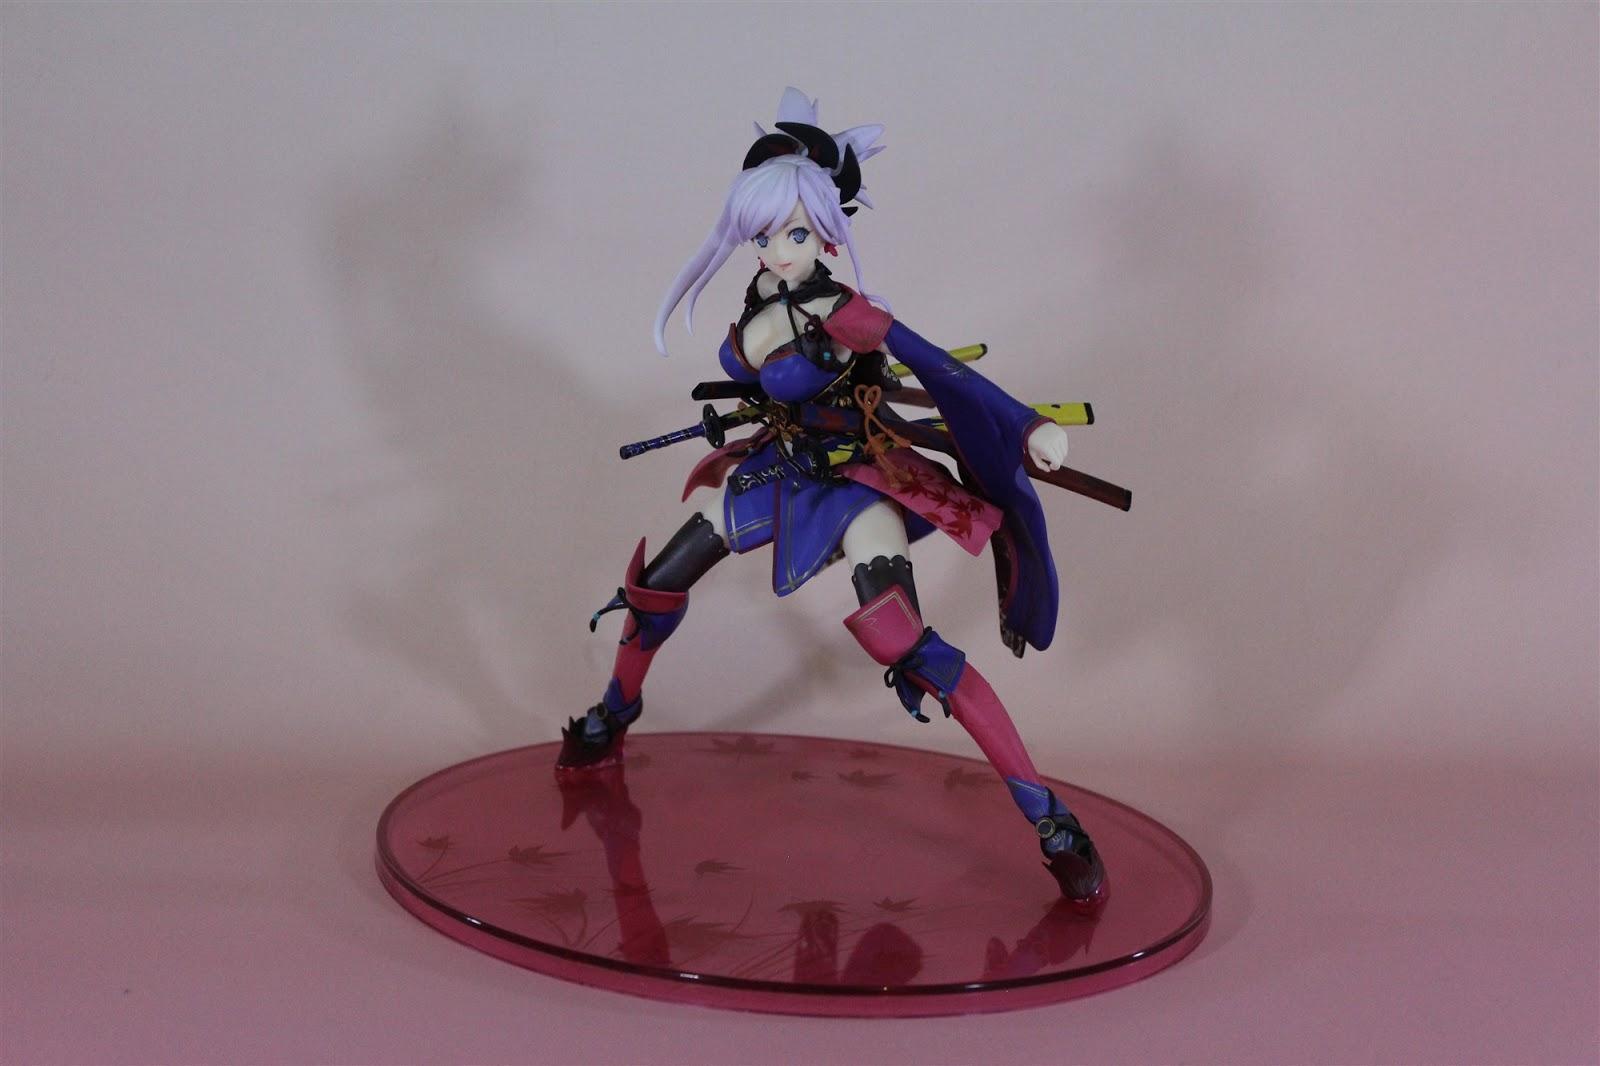 Realm of Darkness: Fate/Grand Order Ichiban Kuji 1/8